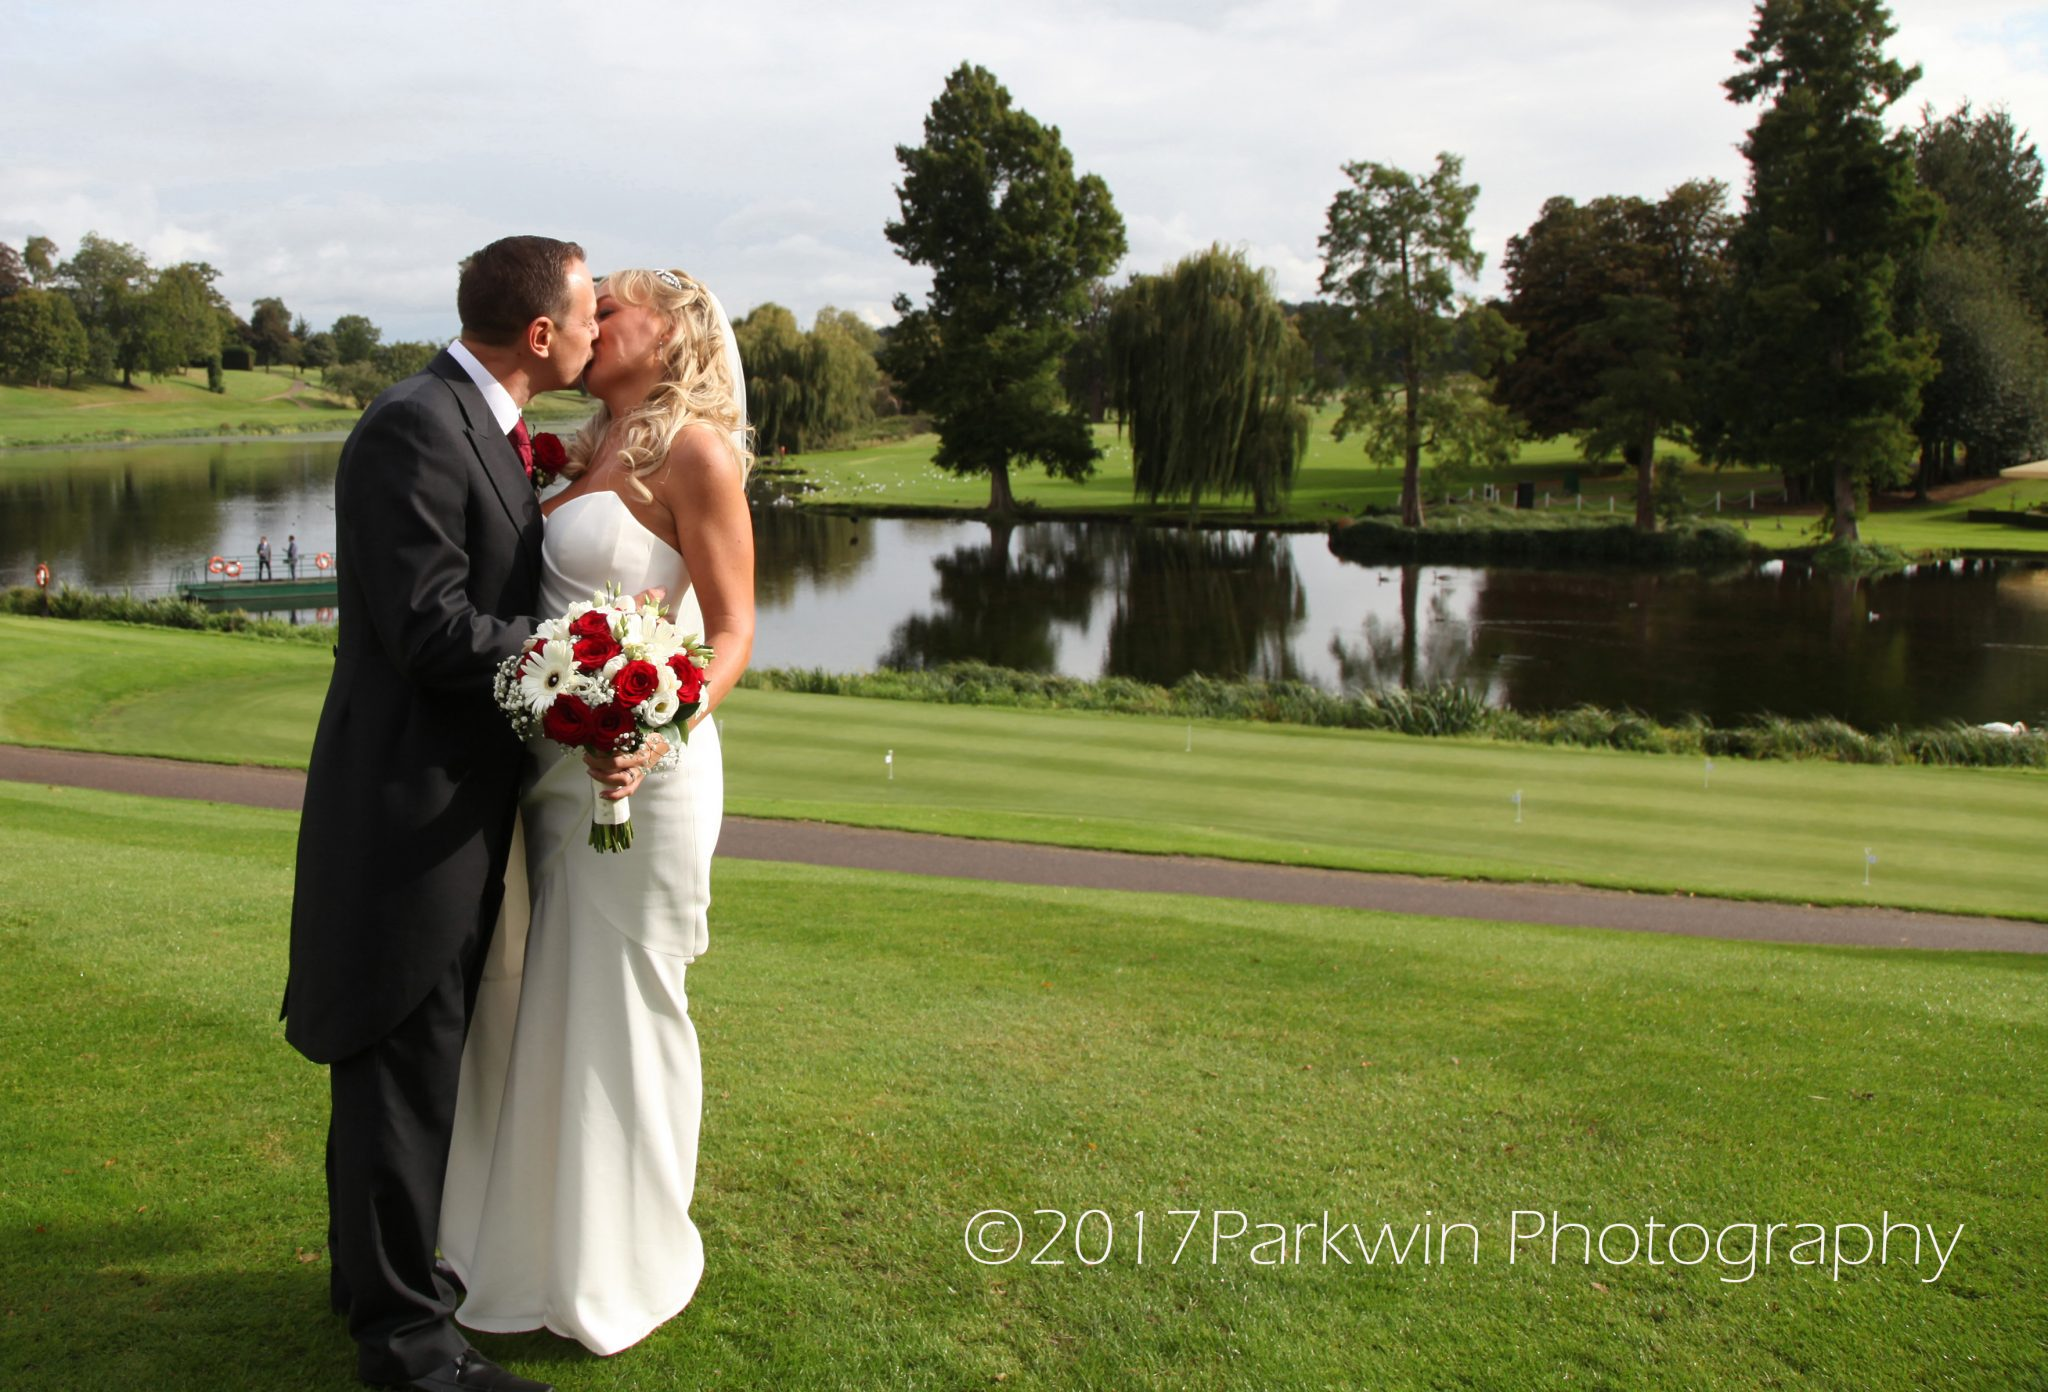 Bride and groom by lake at Brocket Hall